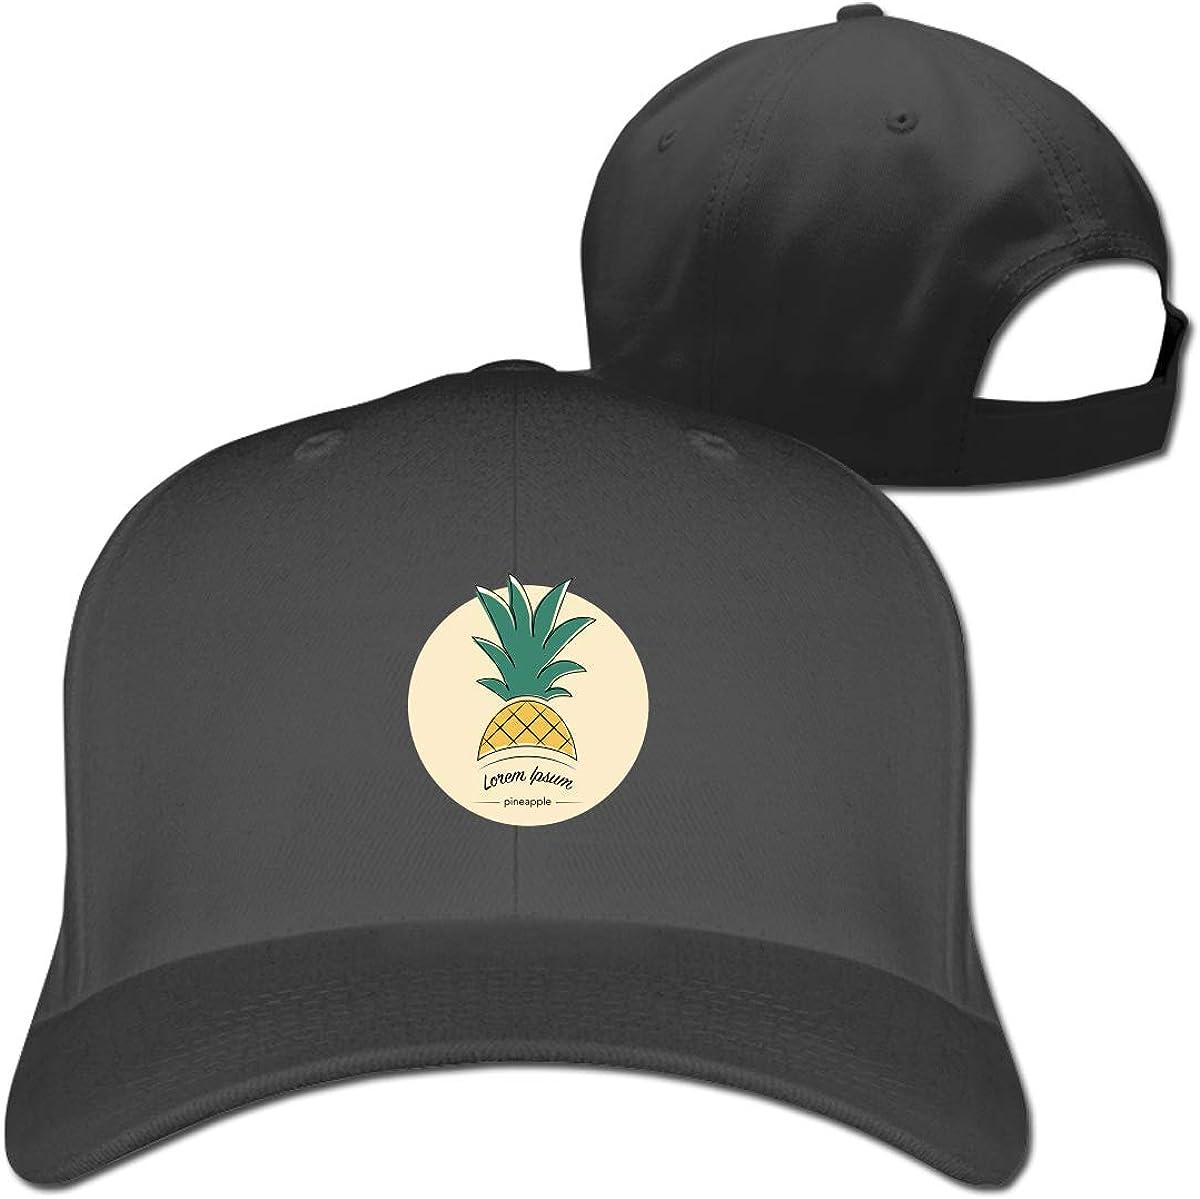 Pineapple Logo Fashion Adjustable Cotton Baseball Caps Trucker Driver Hat Outdoor Cap Black